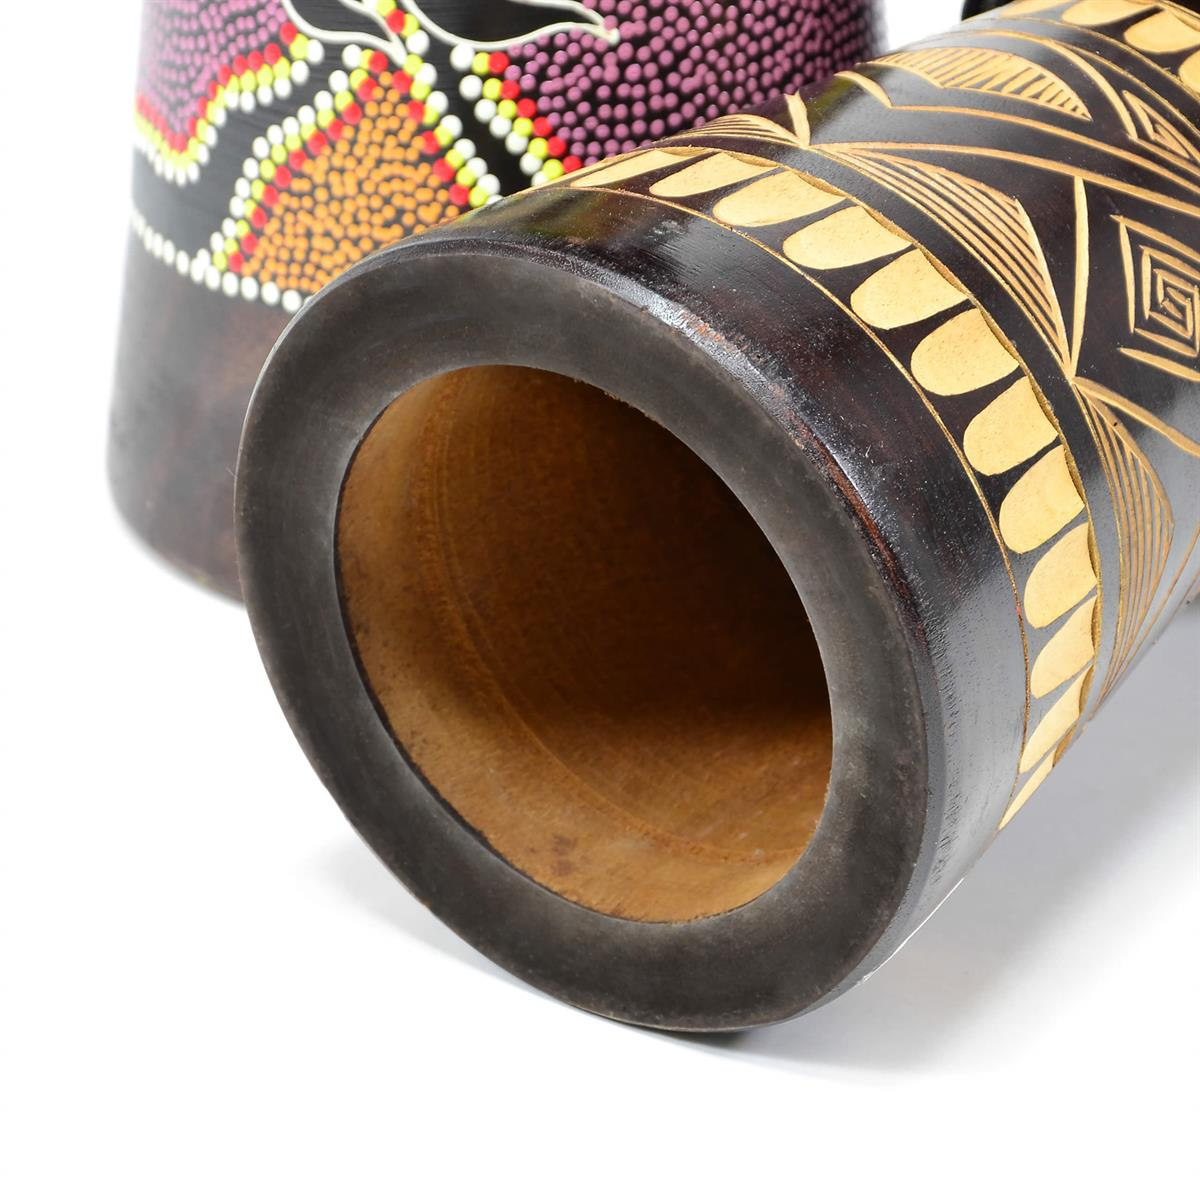 Djembe 50cm Trommel Bali geschnitzt Afrika Bongo Drum Handarbeit